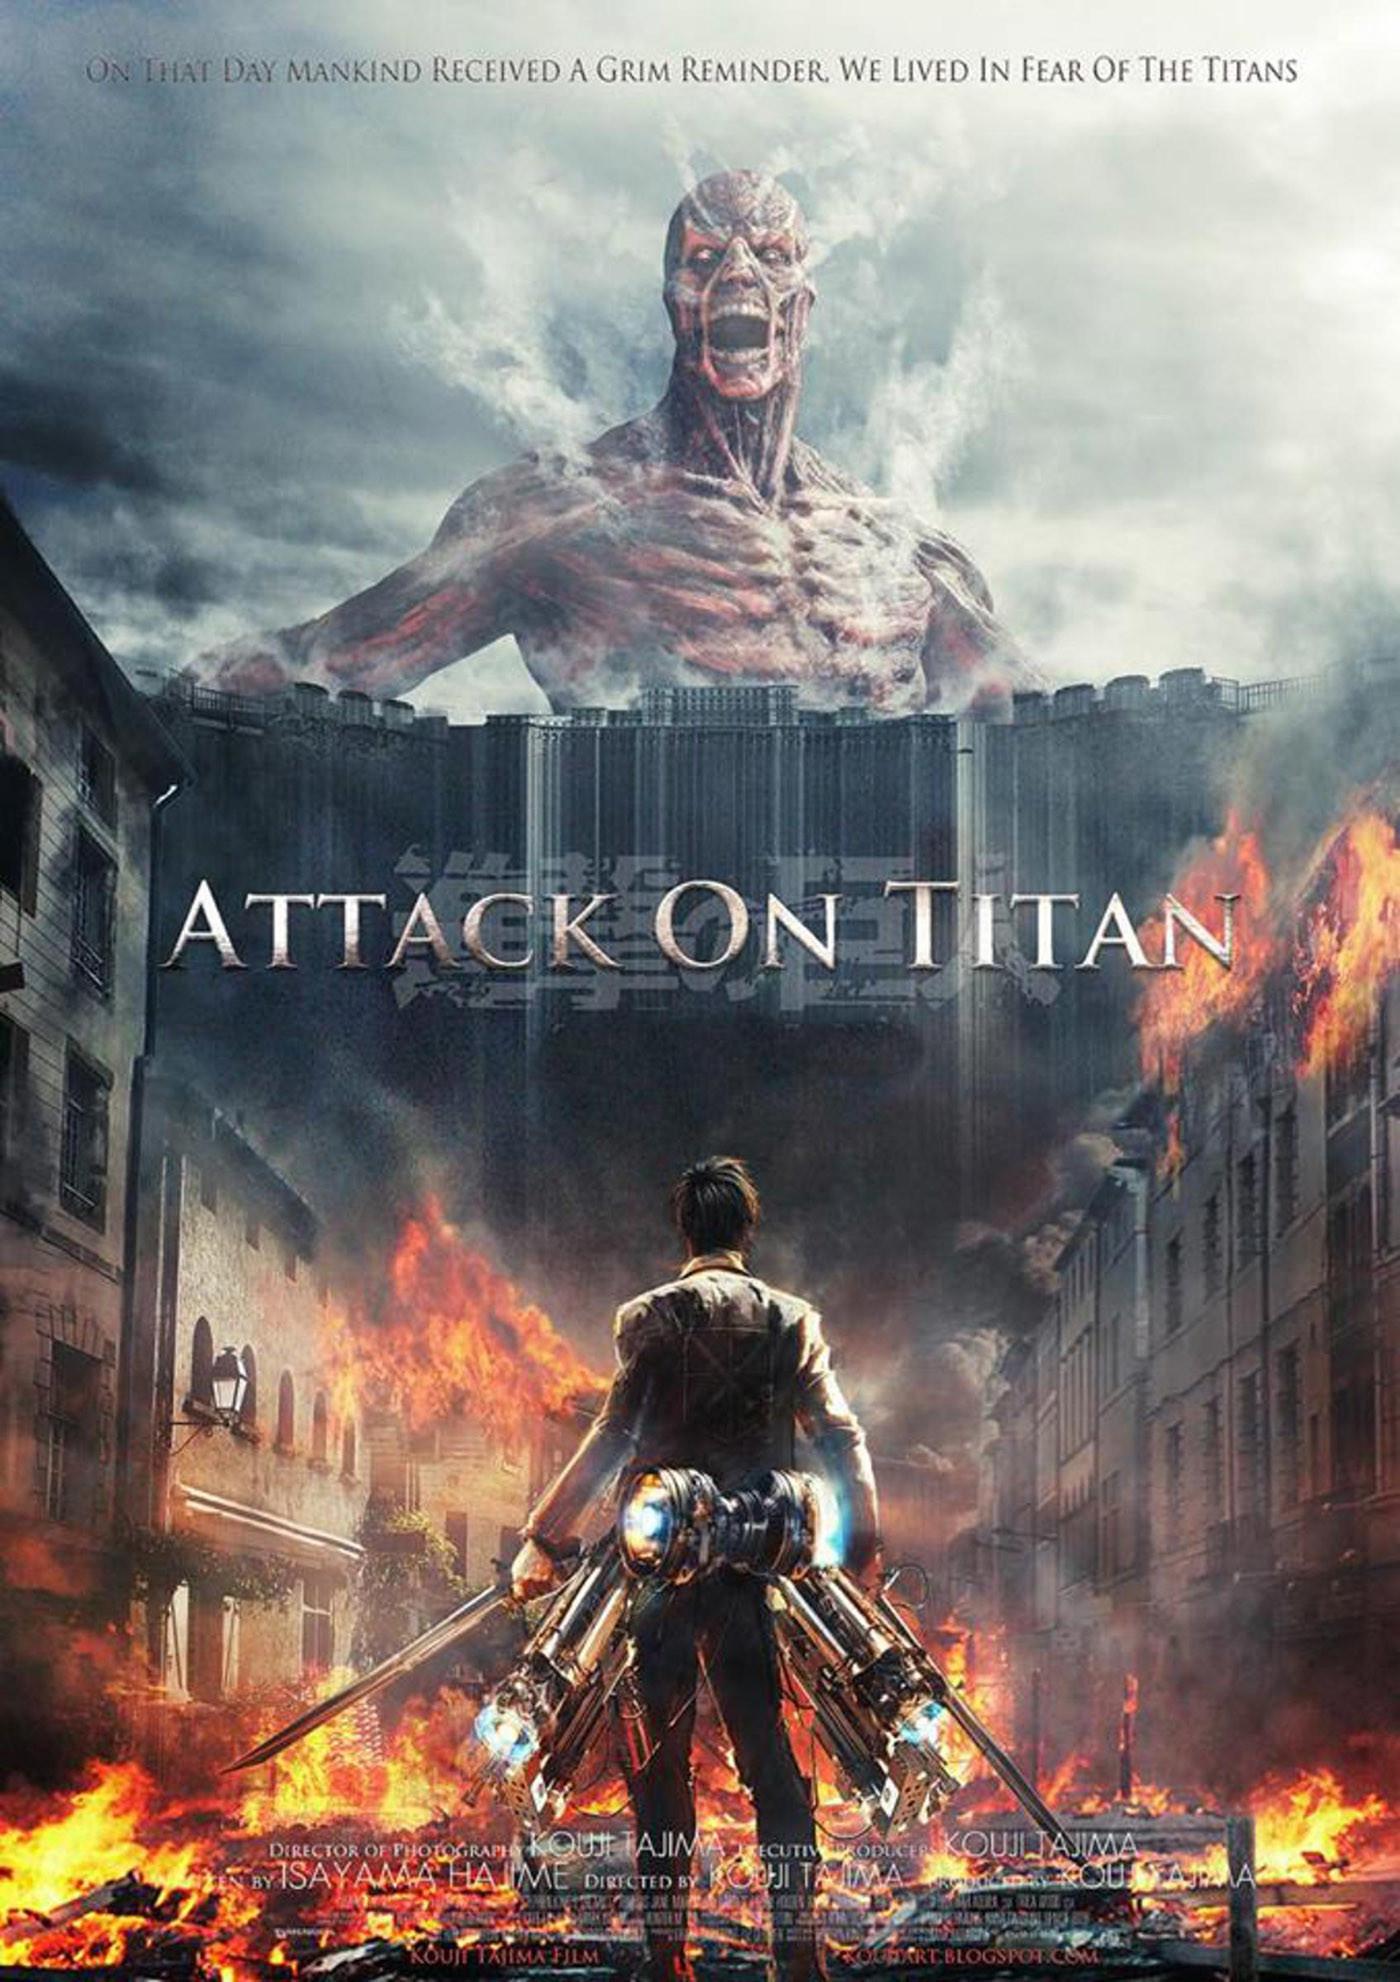 Attack on Titan Attack on Titan by Hajime Isayama 1400×1982